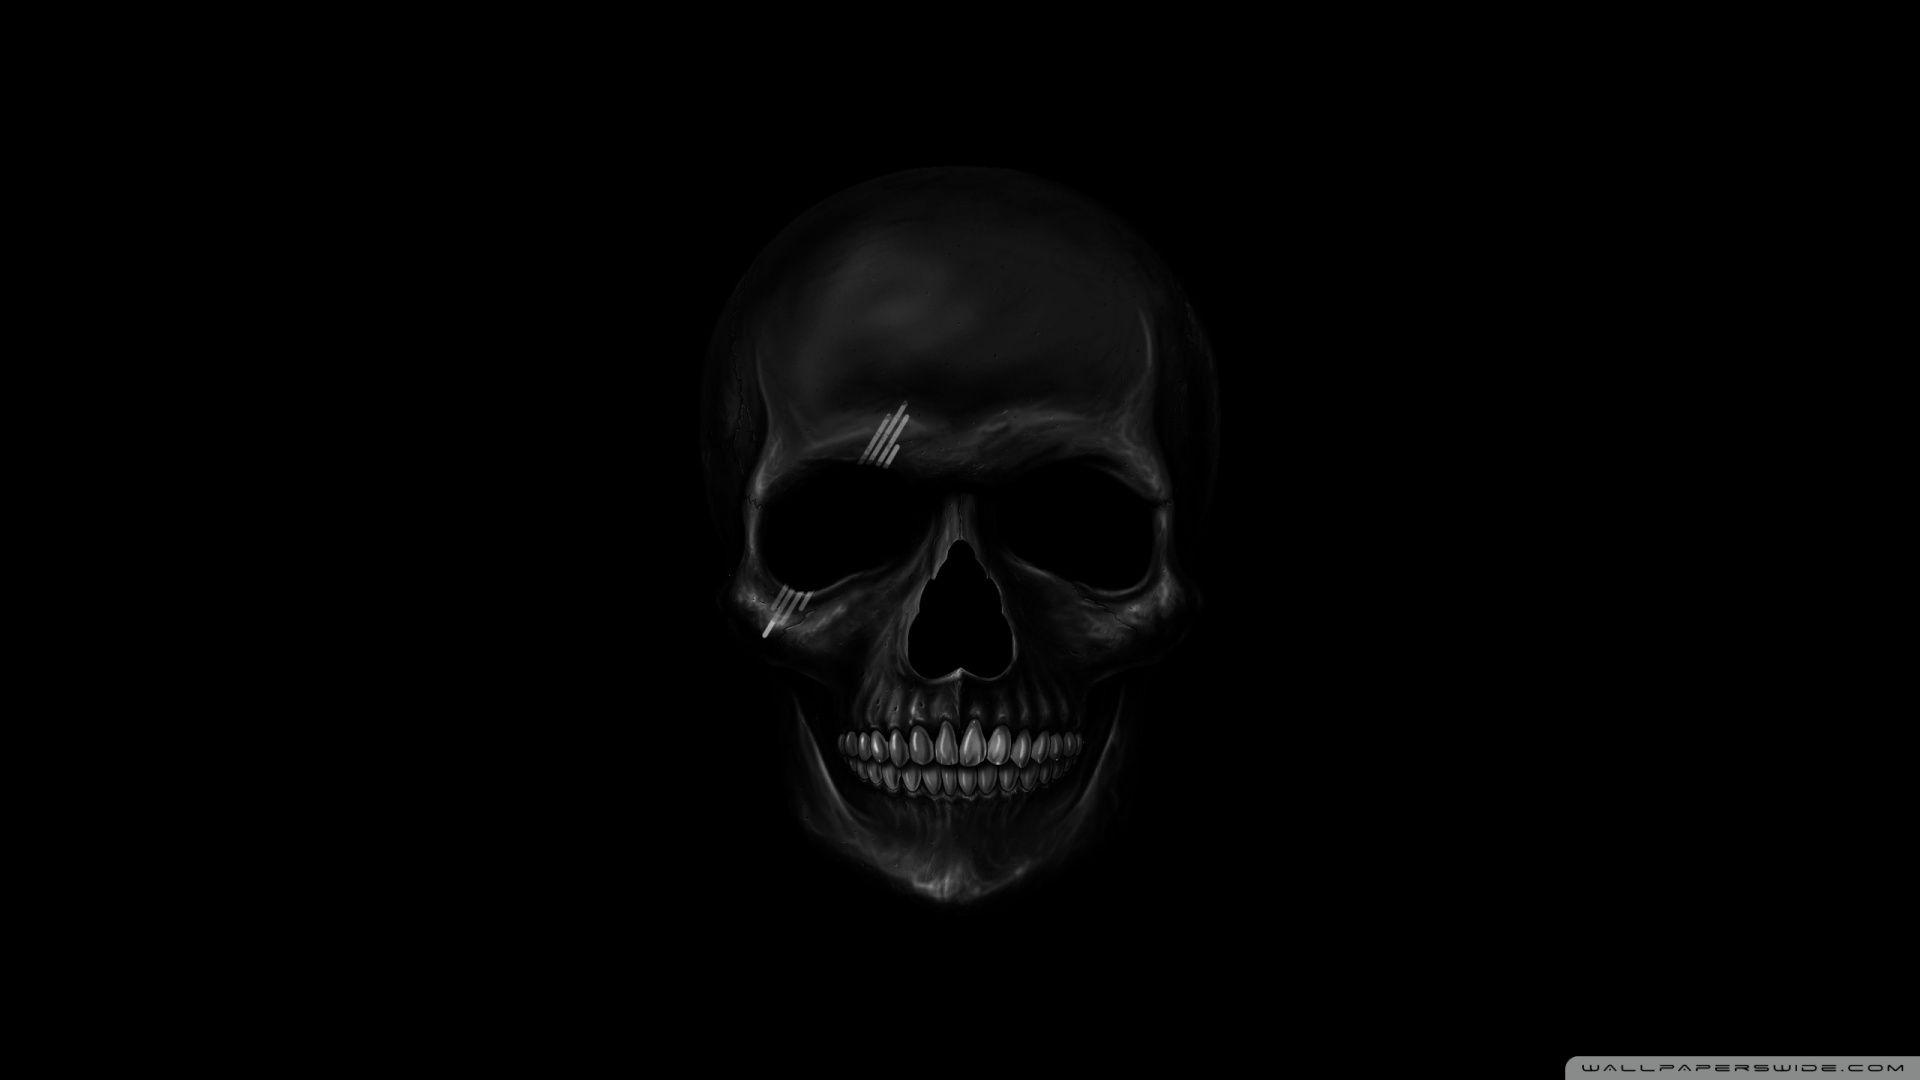 Pin By Best Wallpaper On Dis Skull Wallpaper Black Hd Wallpaper Hd Skull Wallpapers